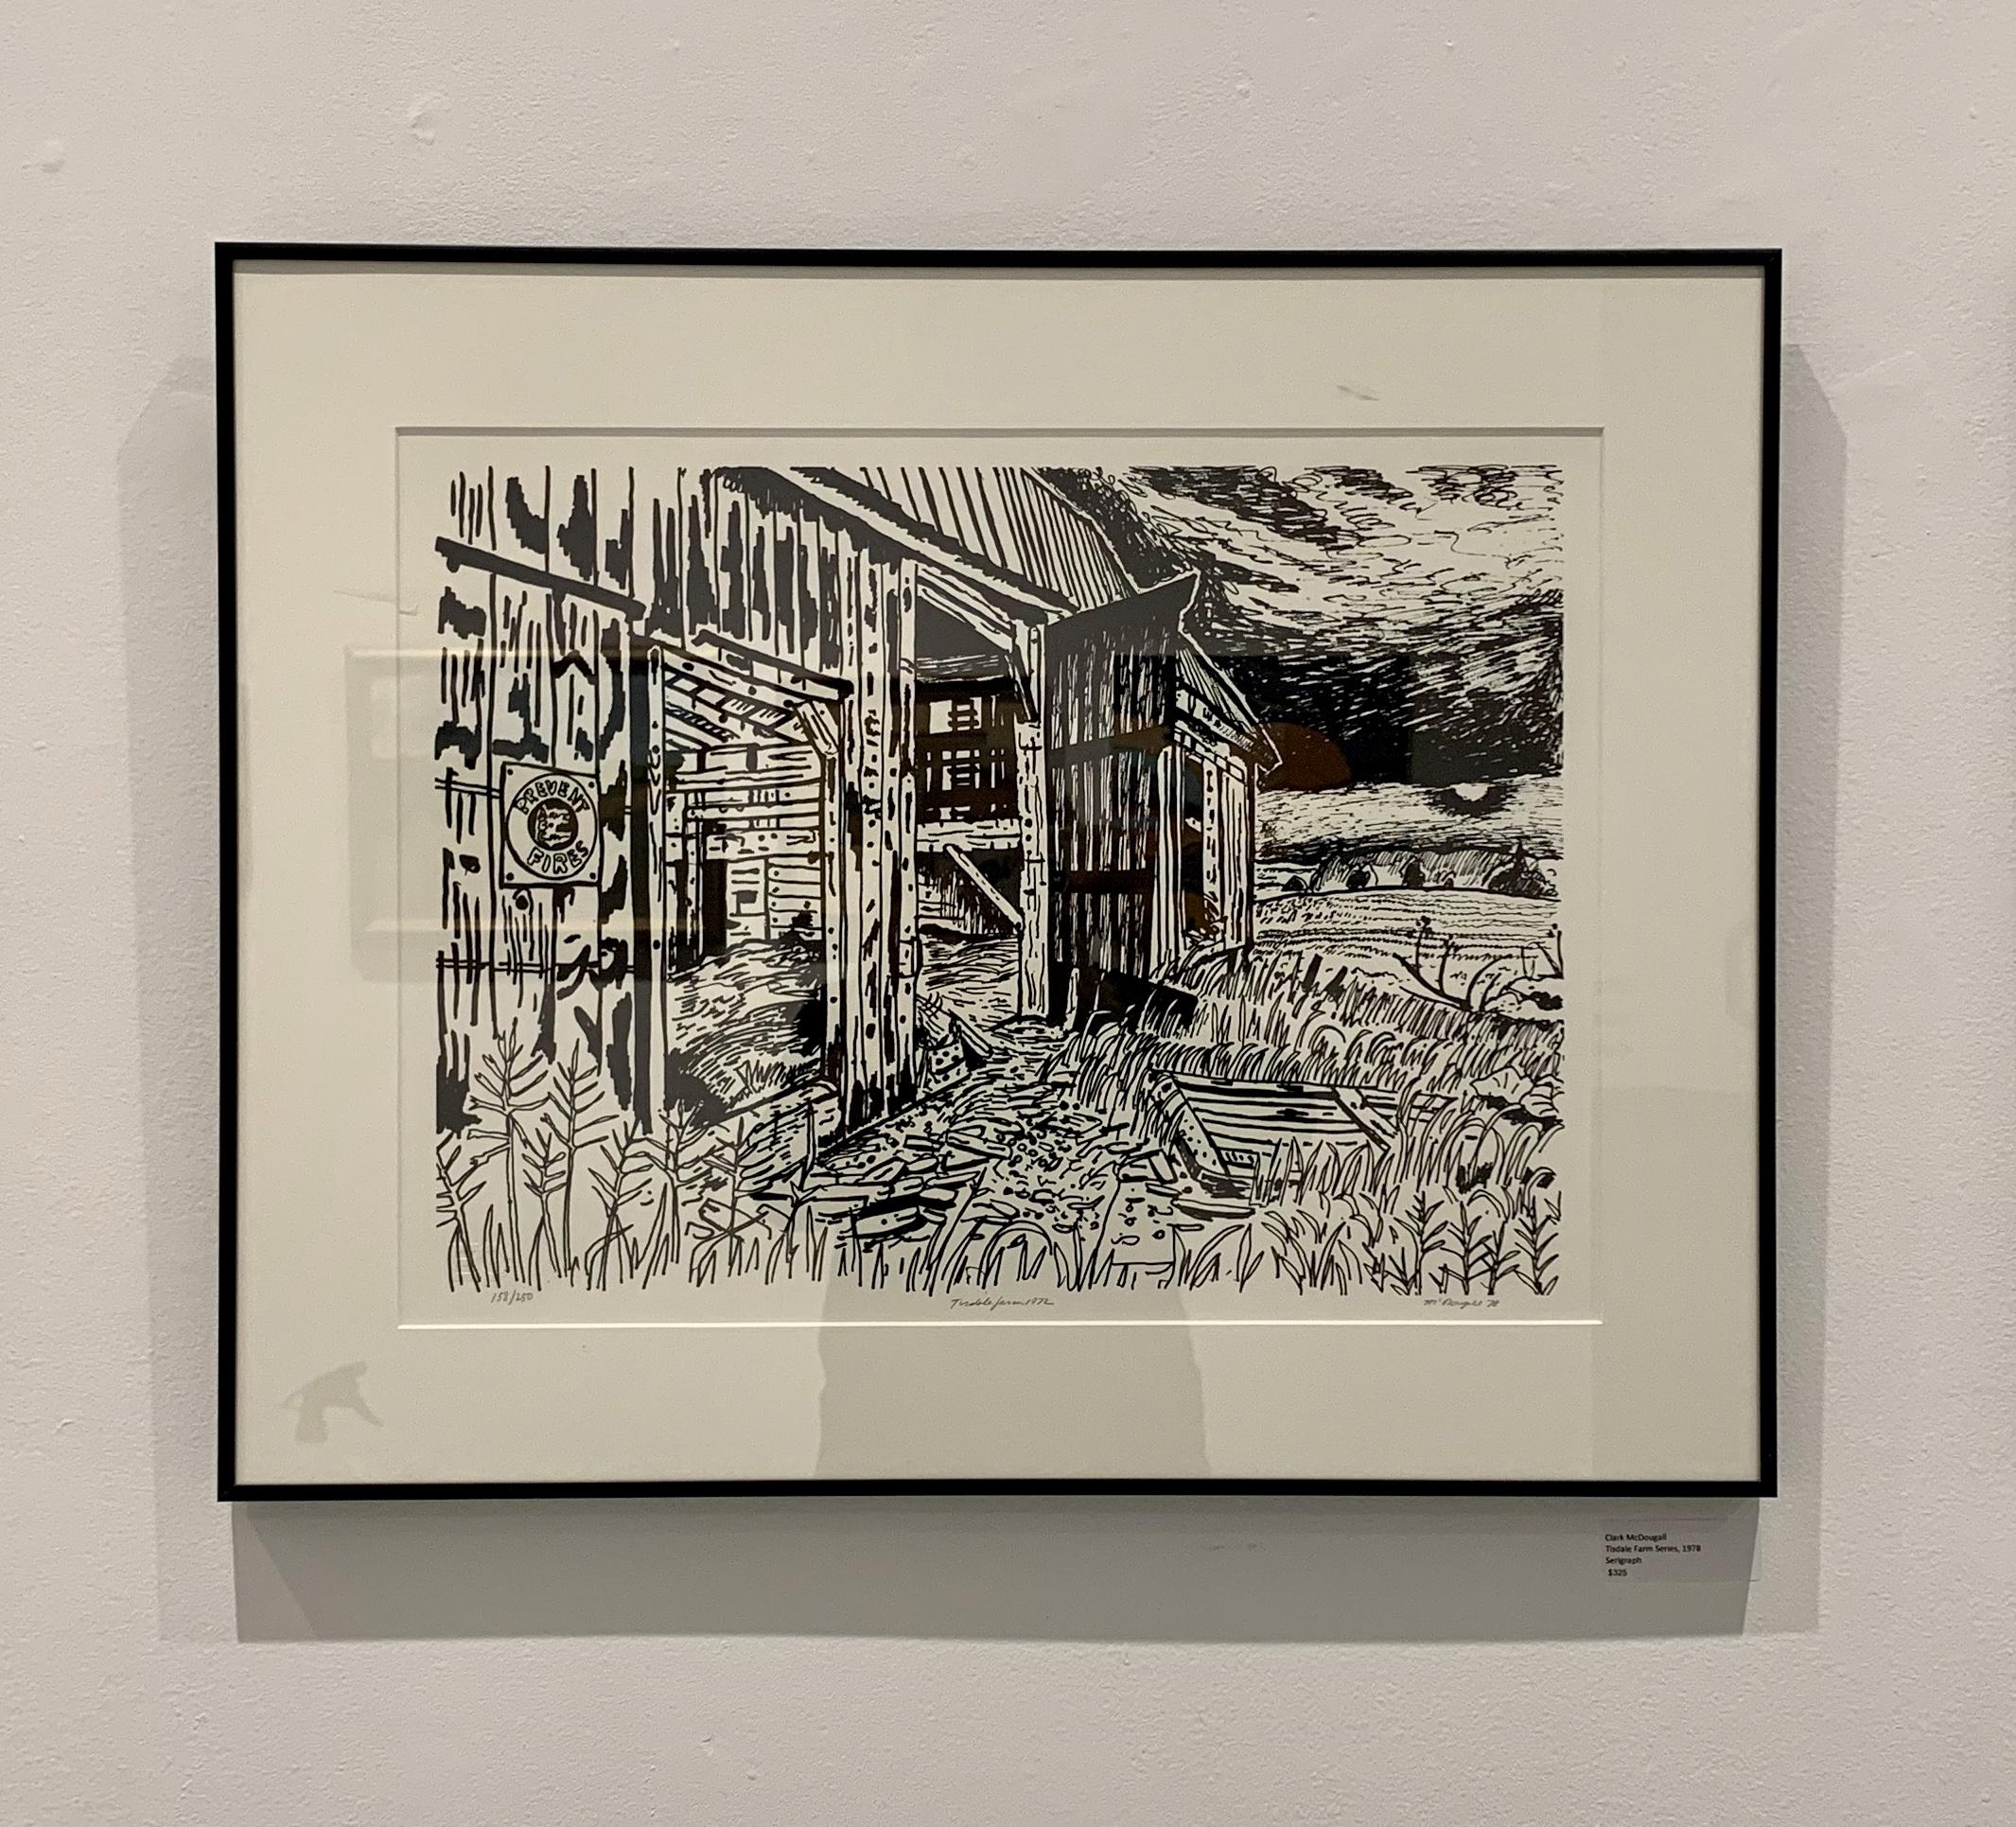 Clark McDougall, Tisdale Farm Series, 1978 $325